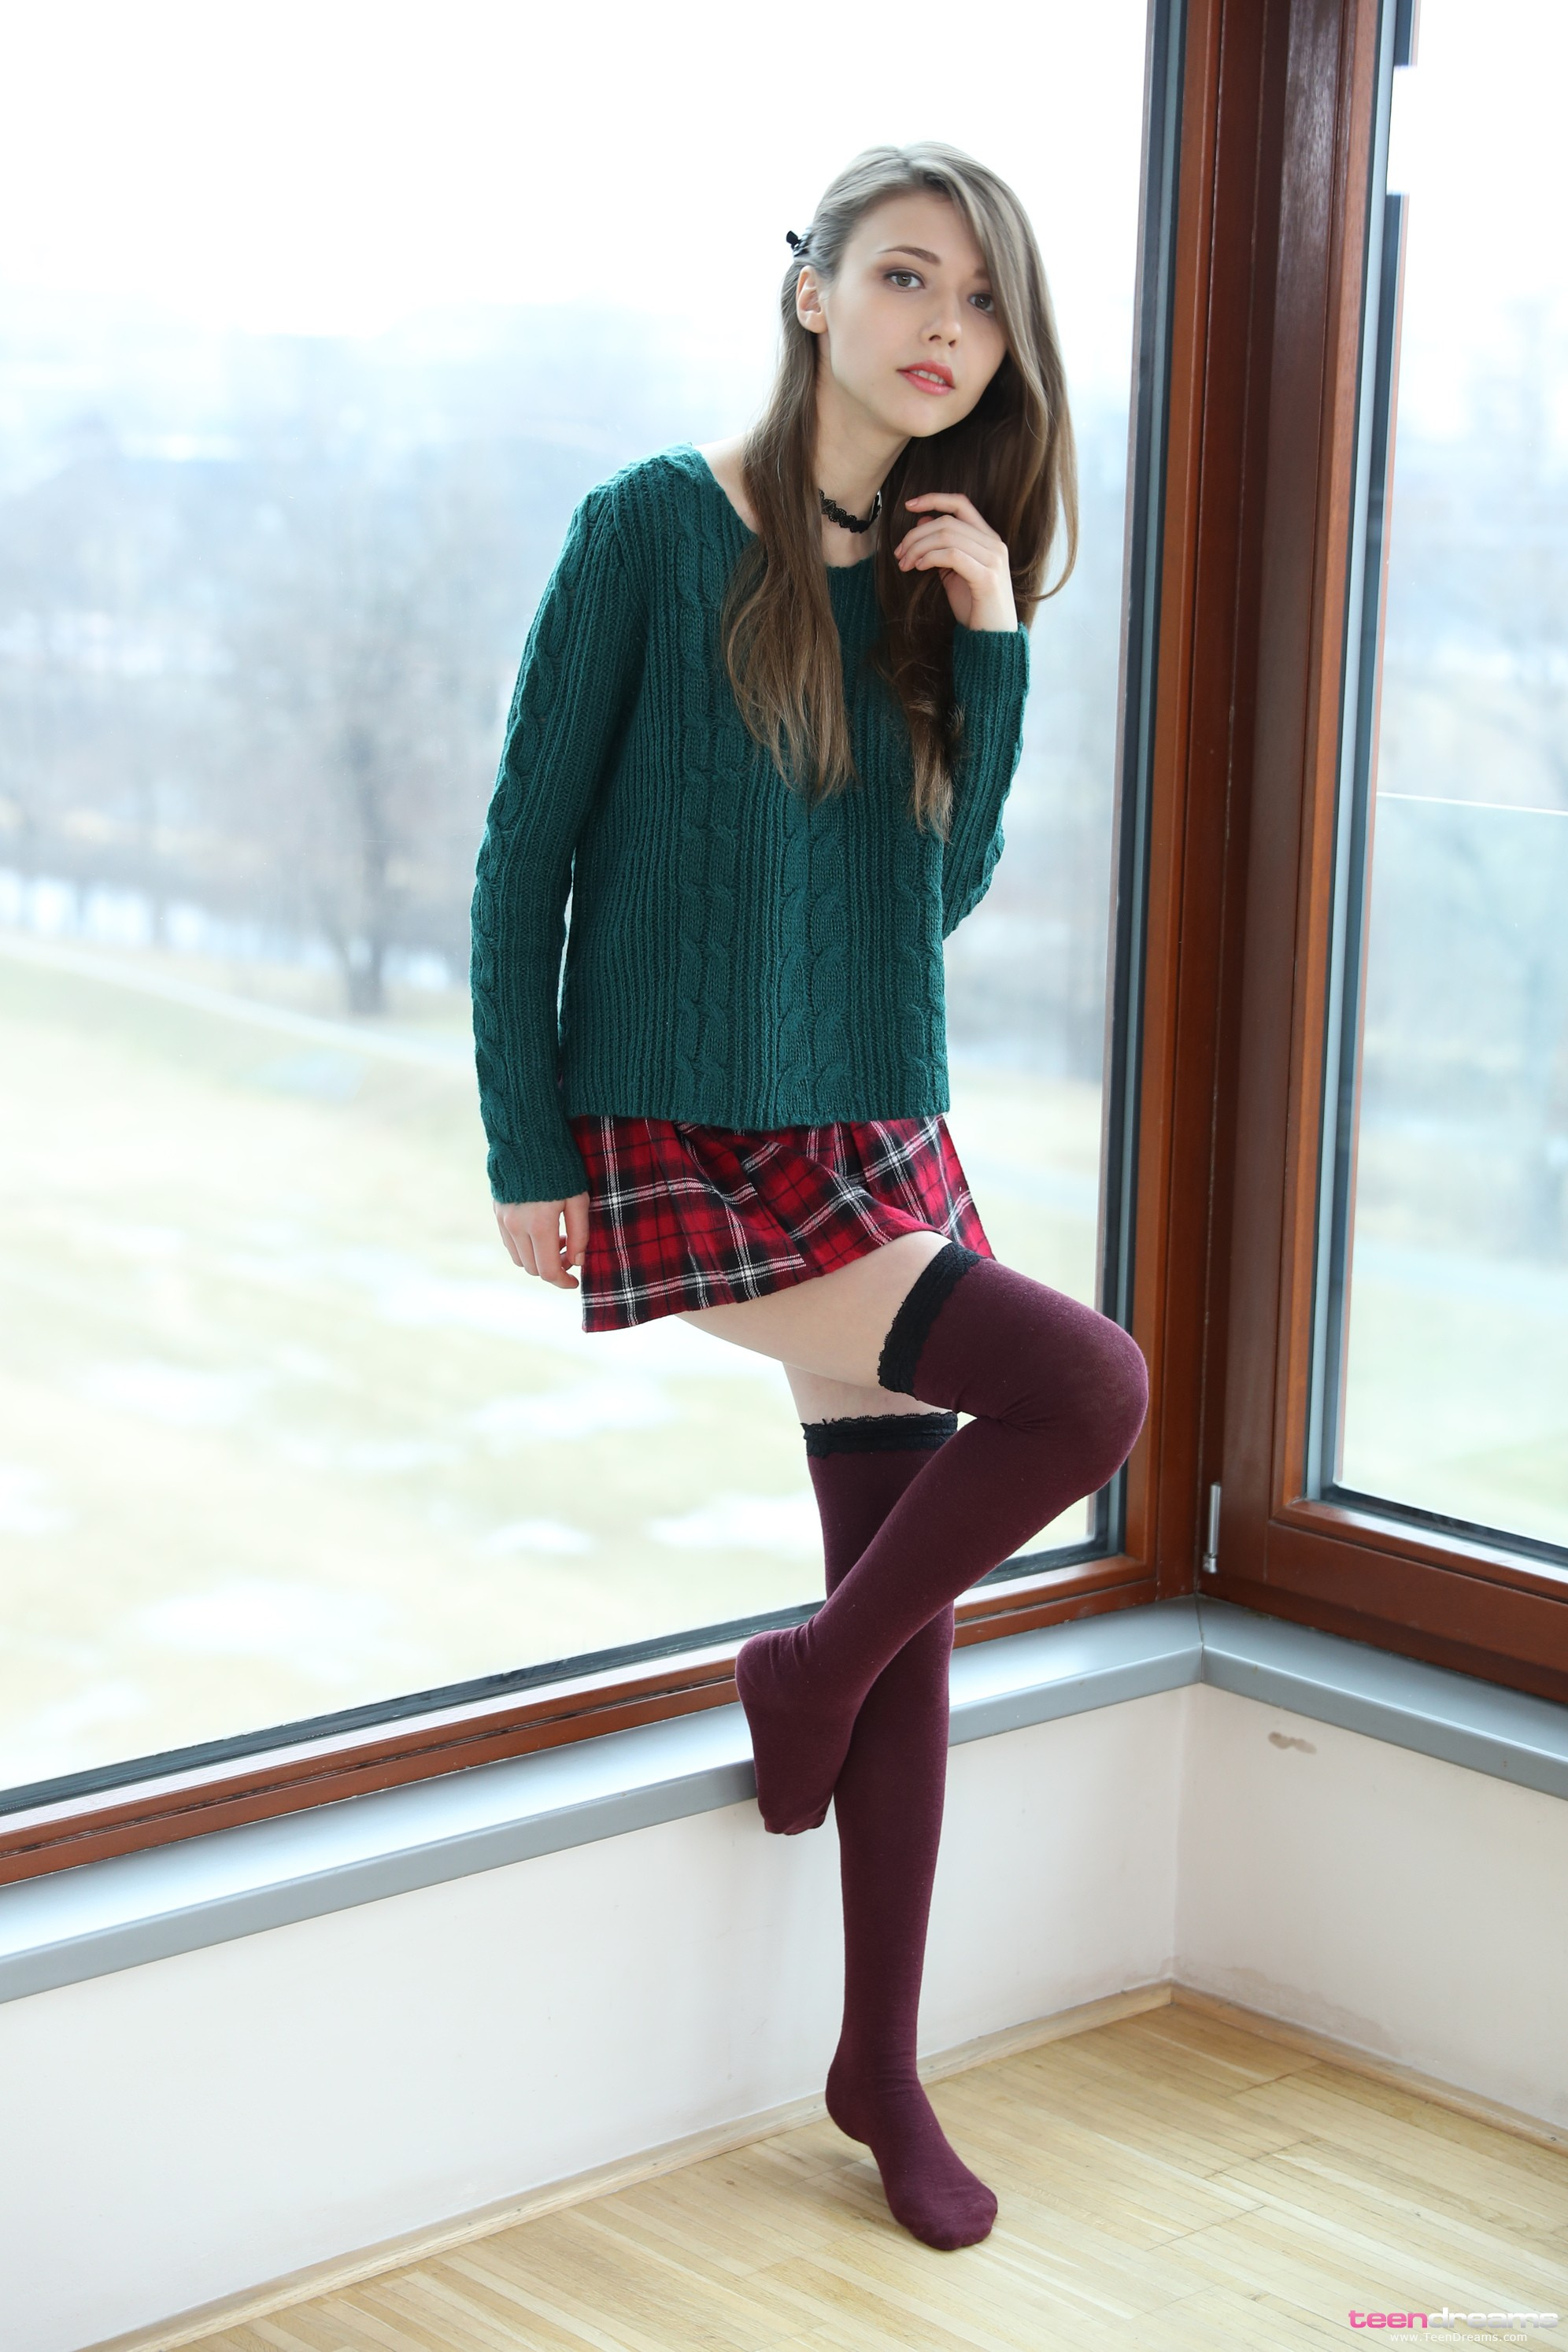 People 1992x2988 Mila Azul model window stockings plaid skirt sweater tiptoe Teendreams pornstar brunette tartan skirt